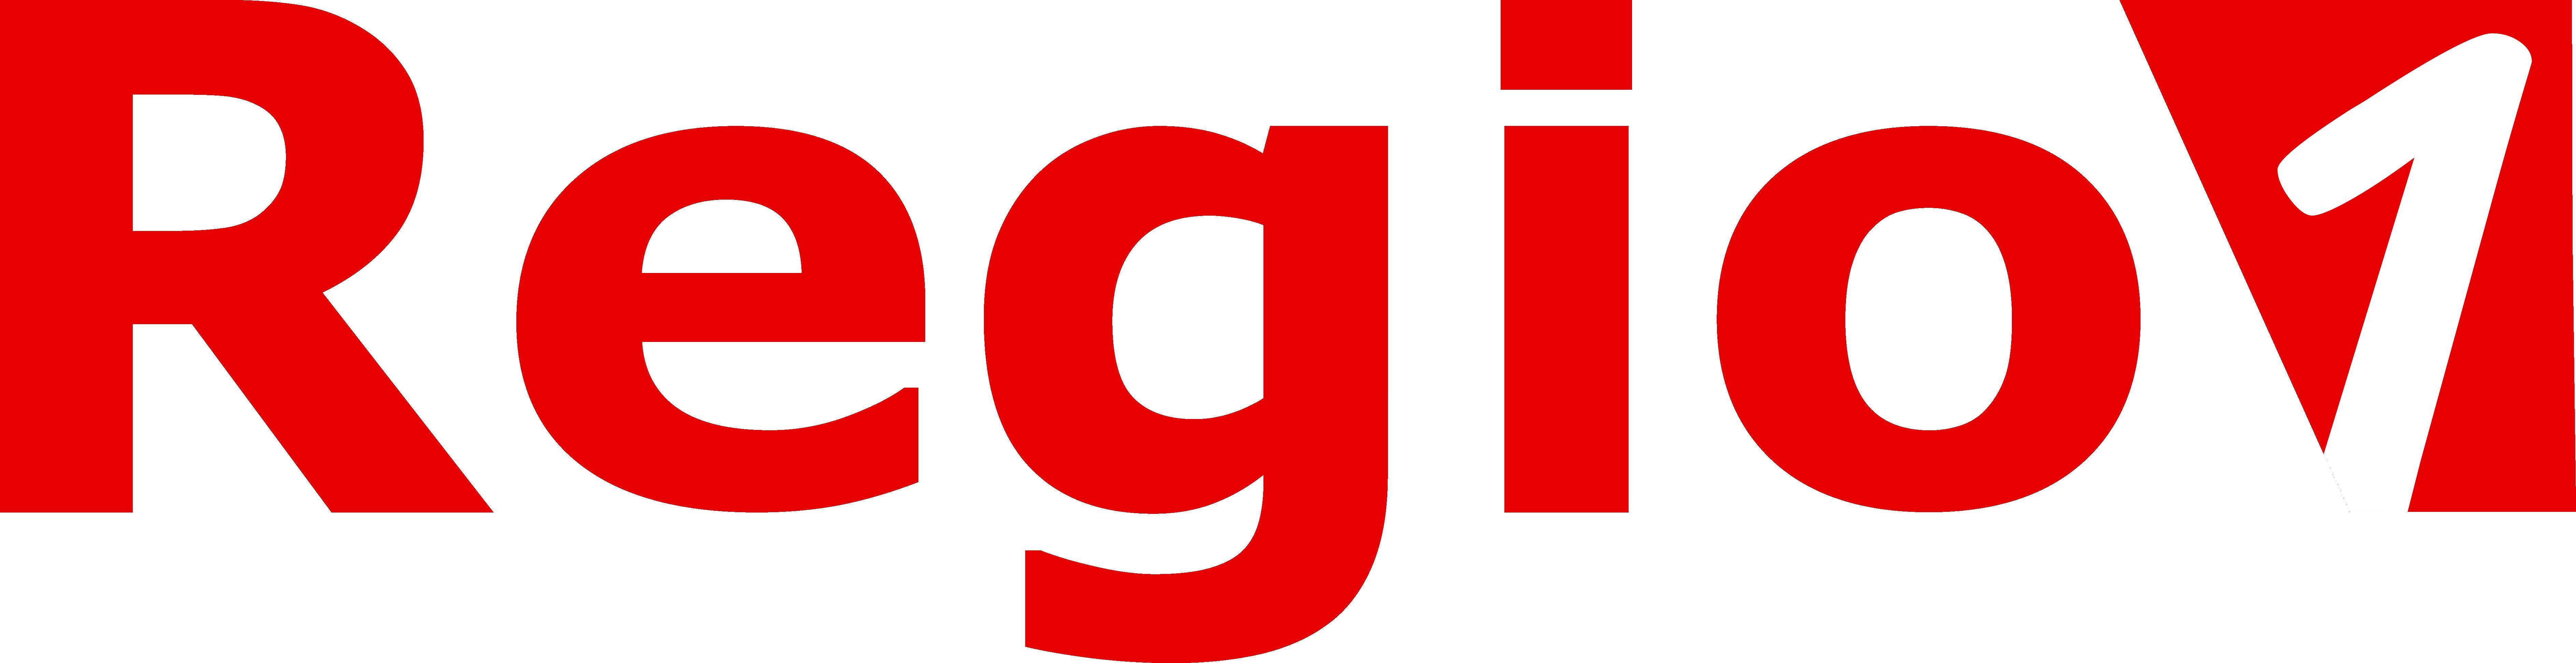 Regio1Media